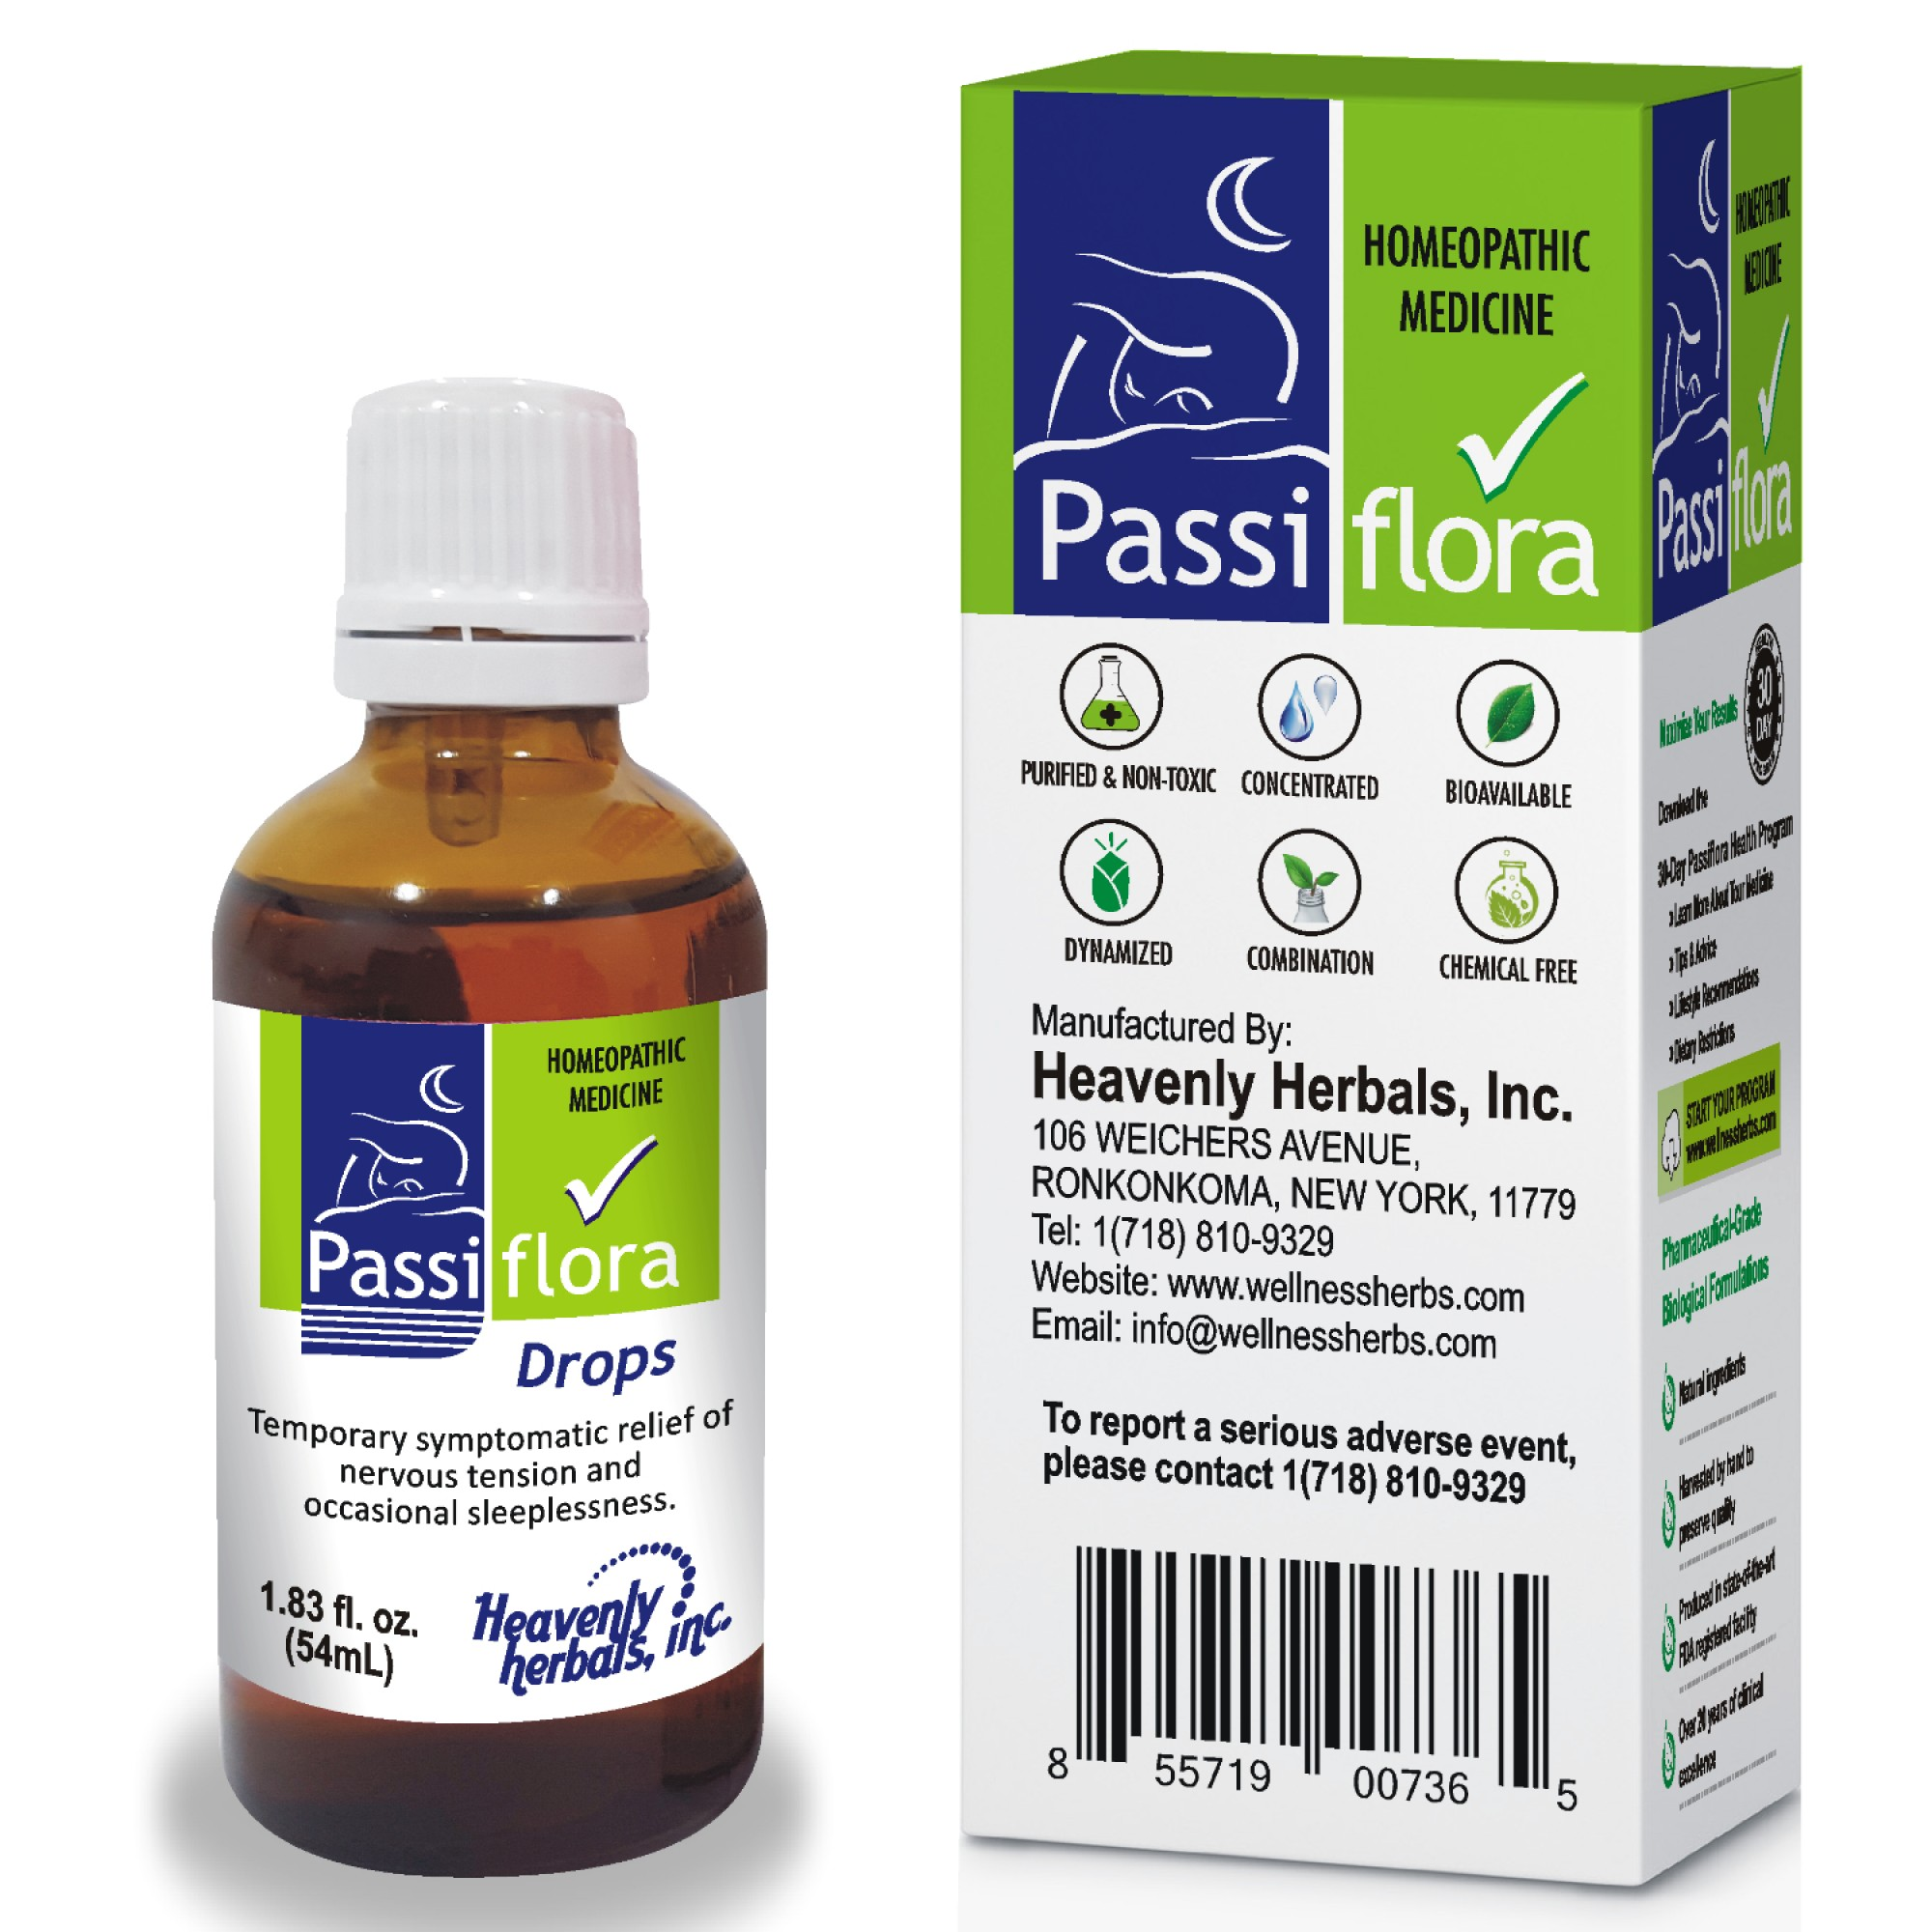 Passiflora Drops